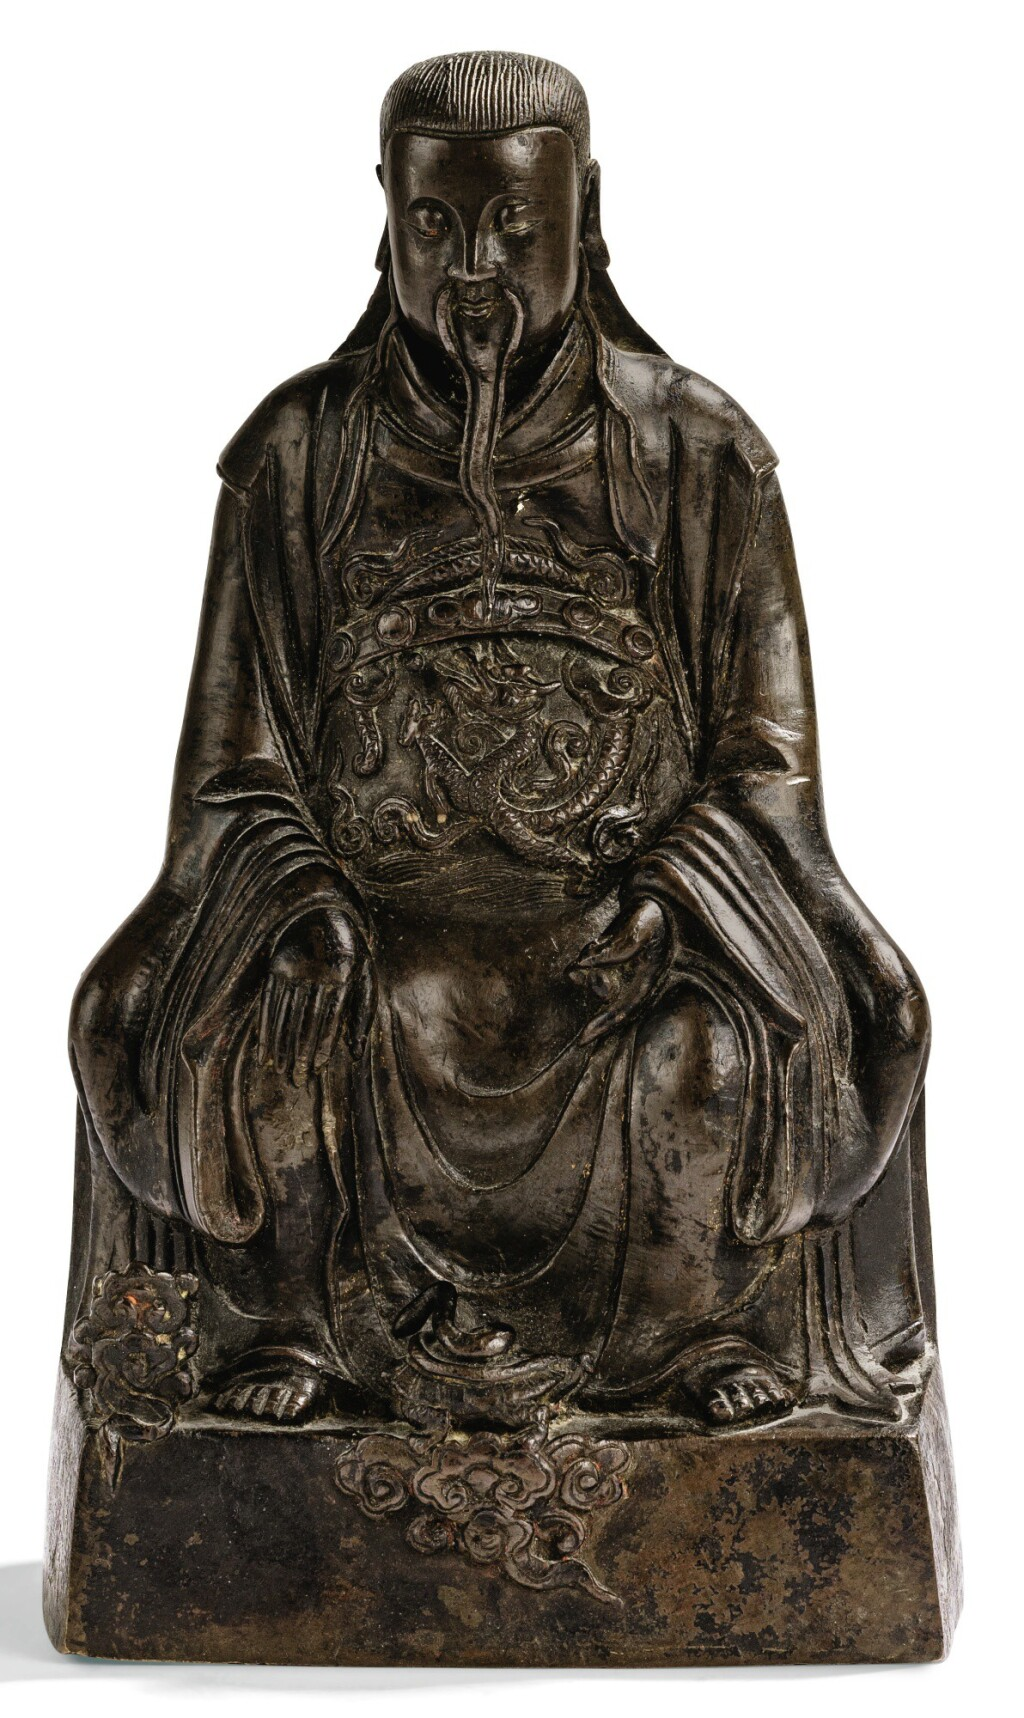 STATUETTE EN BRONZE DE XUANWU DYNASTIE QING, XVIIE-XVIIIE SIÈCLE | 清十七至十八世紀 銅鑄玄武大帝坐像 | A bronze figure of Xuanwu, Qing Dynasty, 17th/18th Century